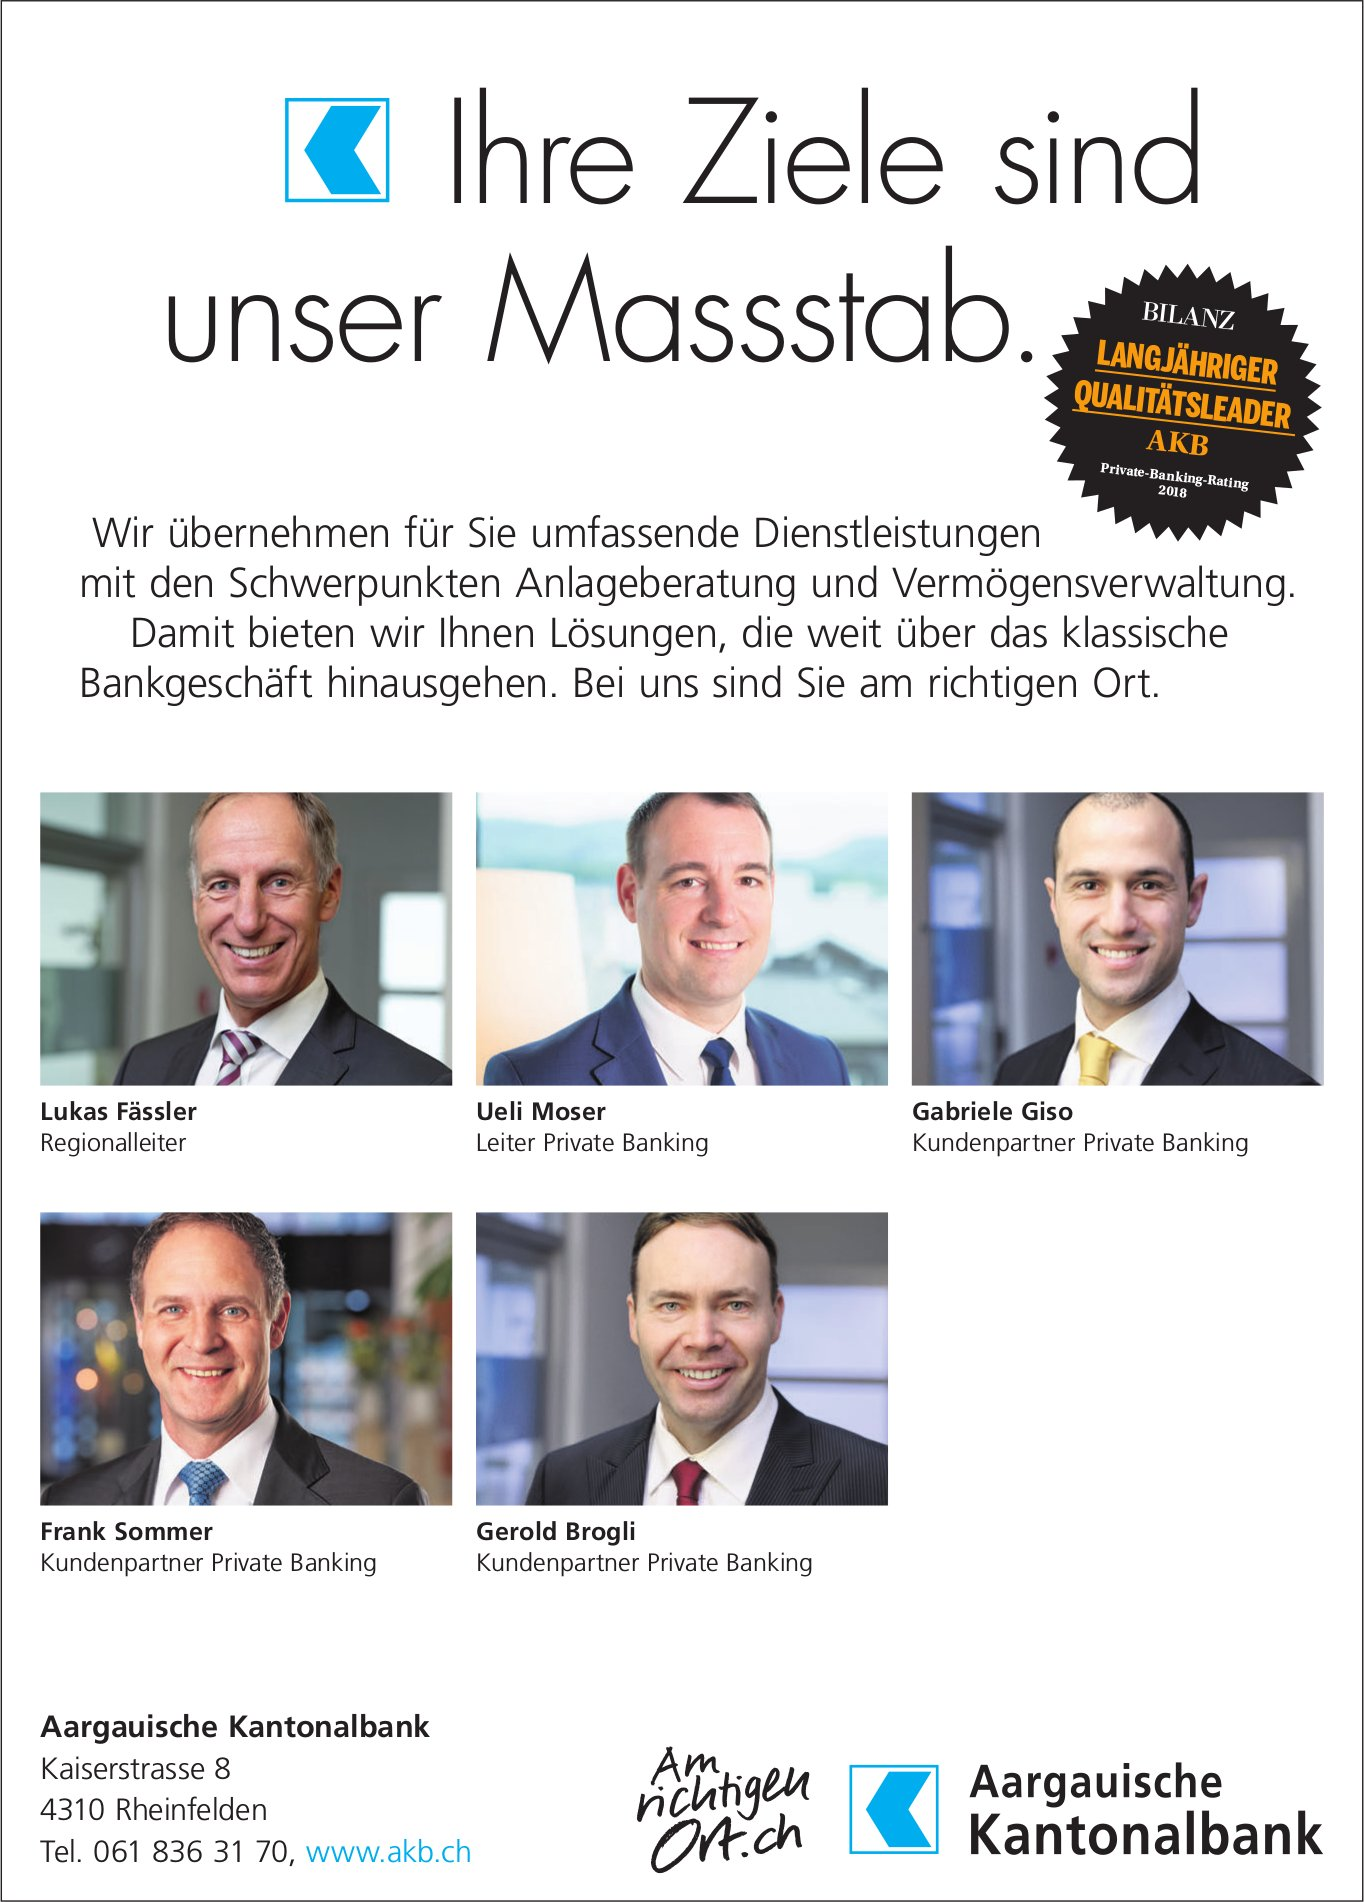 Aargauische Kantonalbank - Ihre Ziele sind unser Massstab.